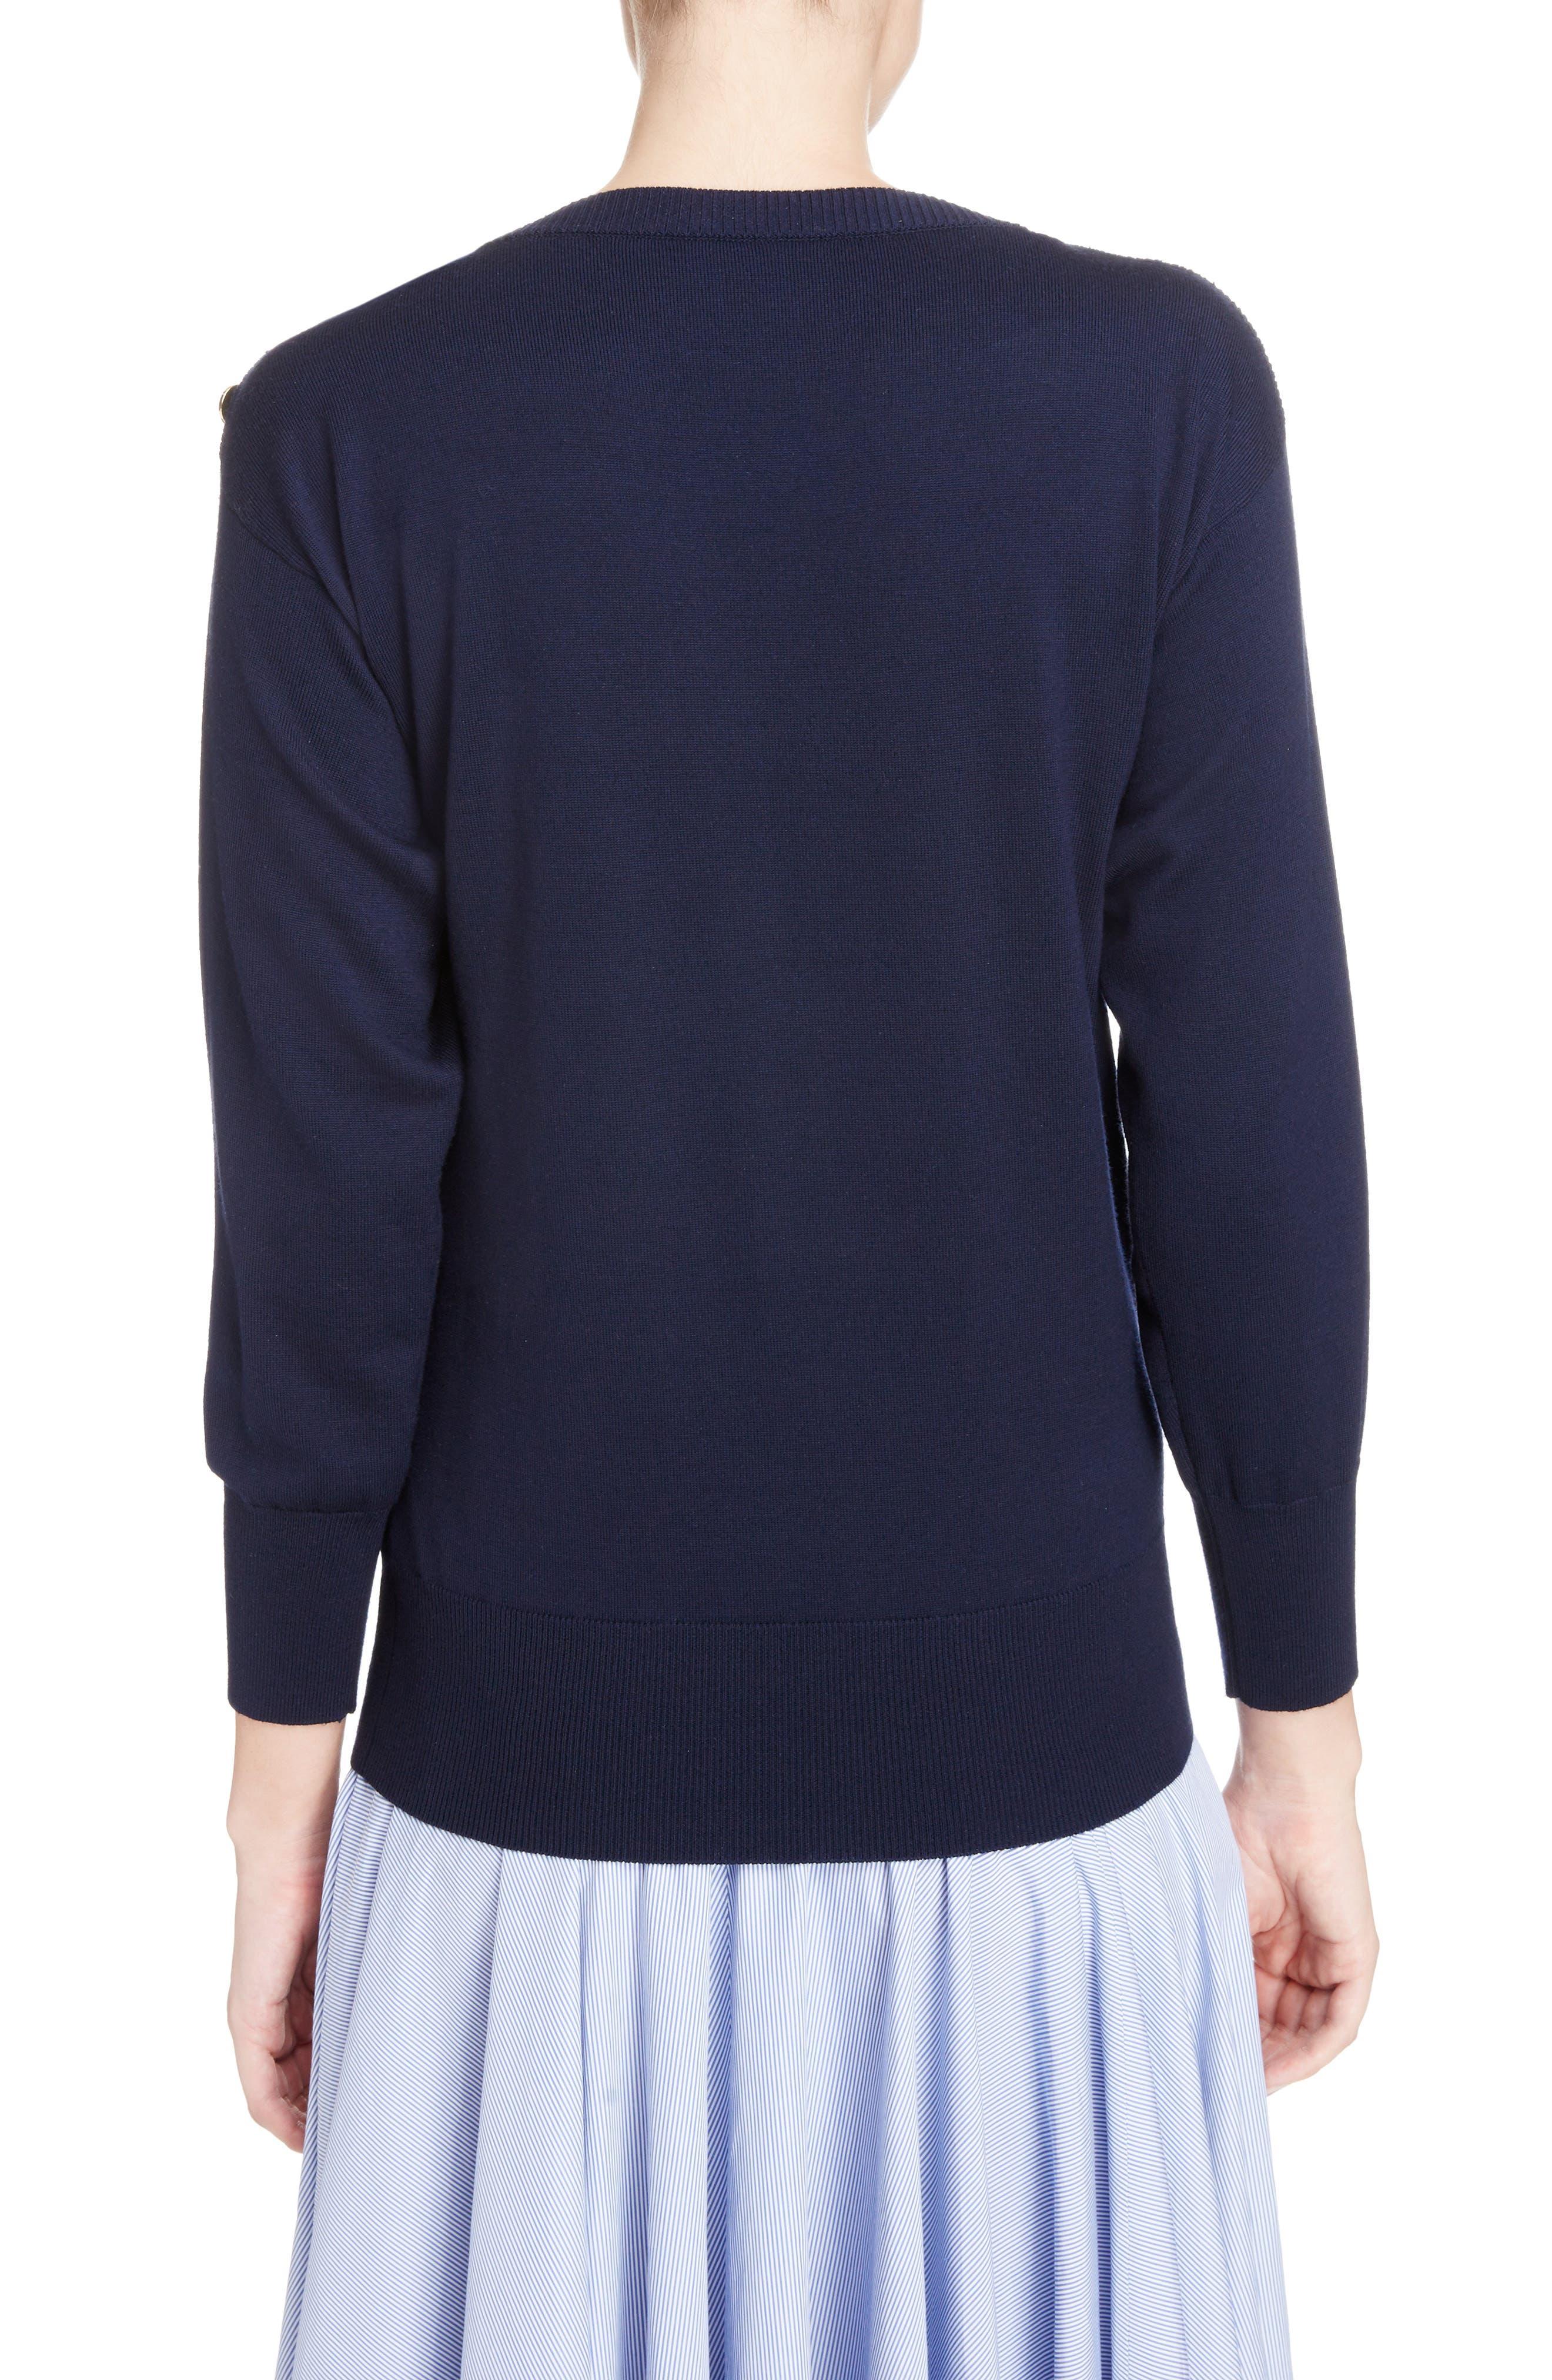 Summer Love Boatneck Sweater,                             Alternate thumbnail 2, color,                             410